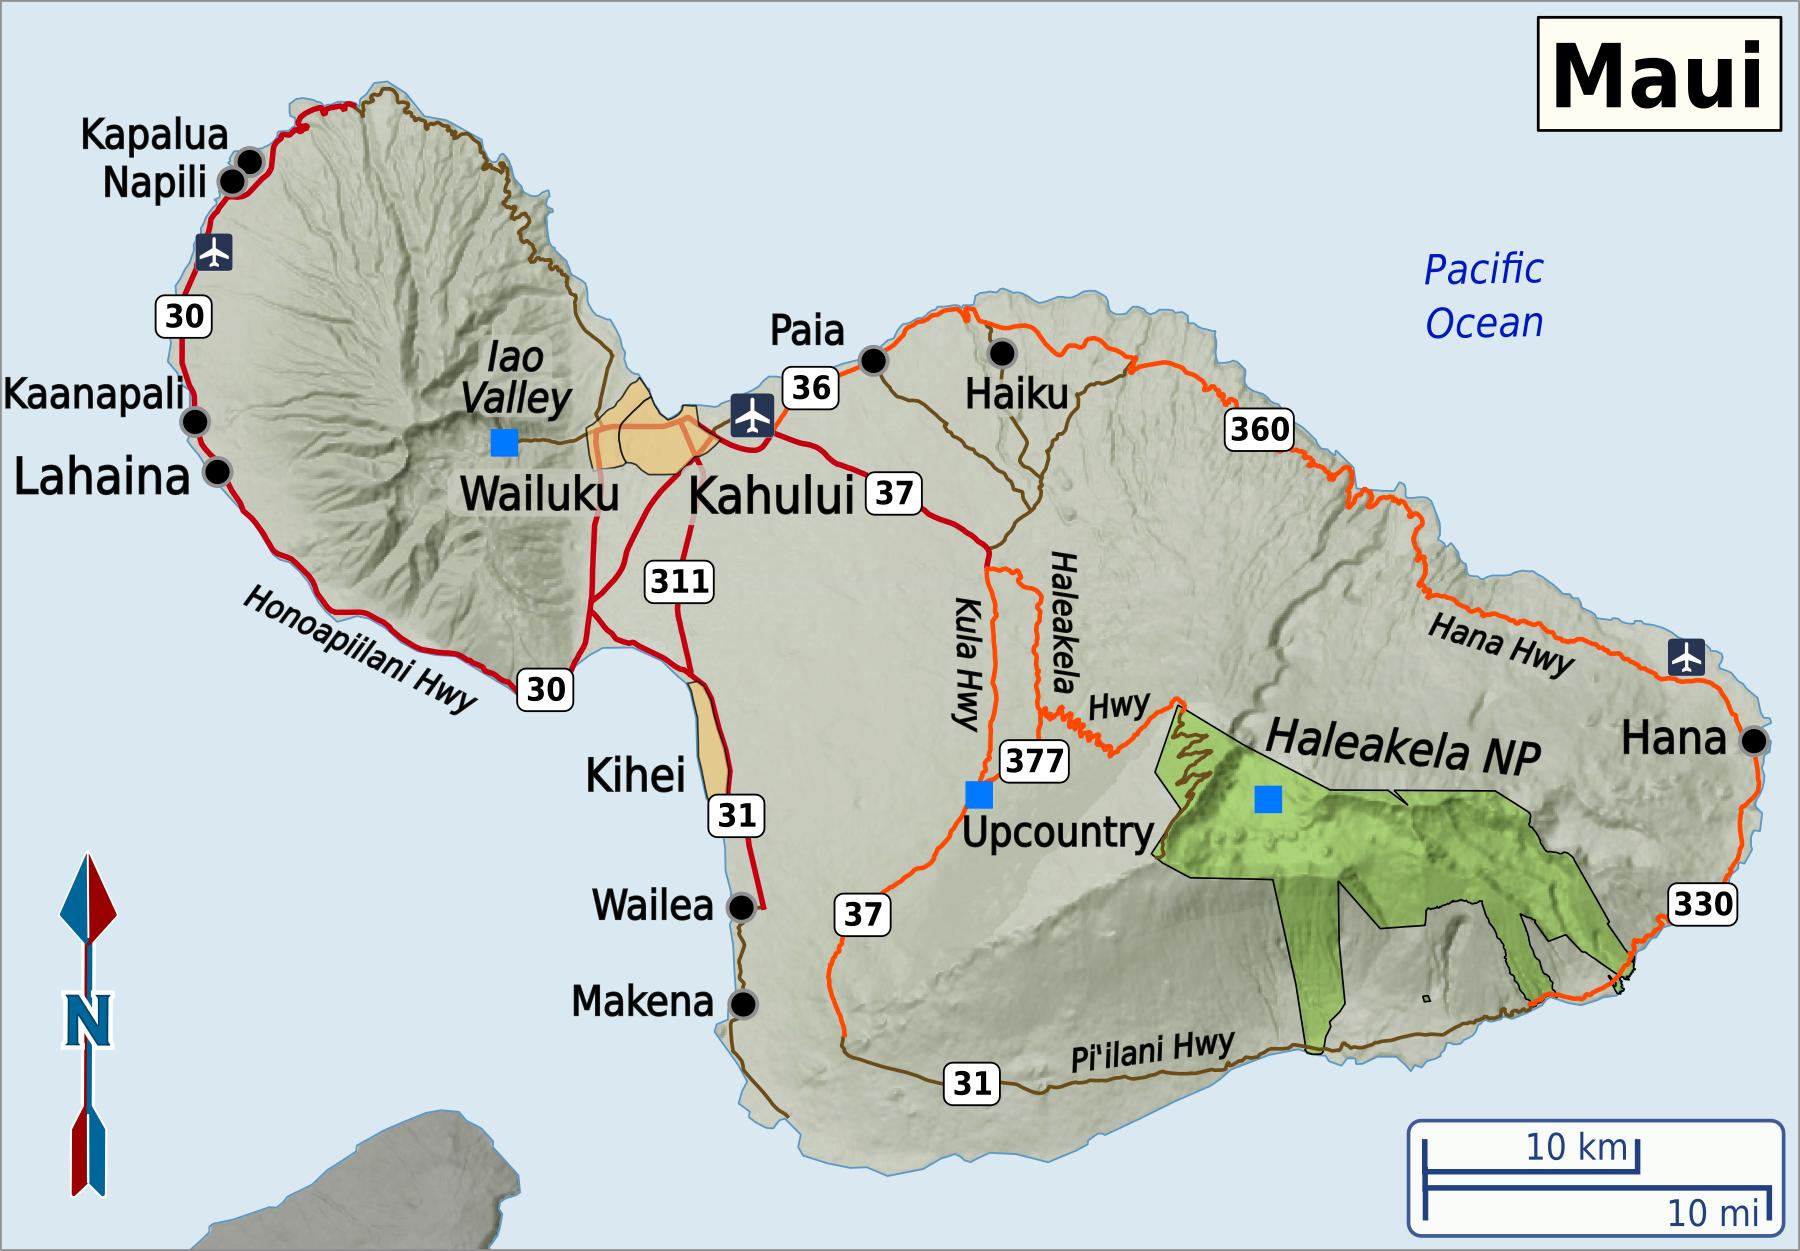 Filemaui region map eng wikimedia commons filemaui region map eng thecheapjerseys Image collections